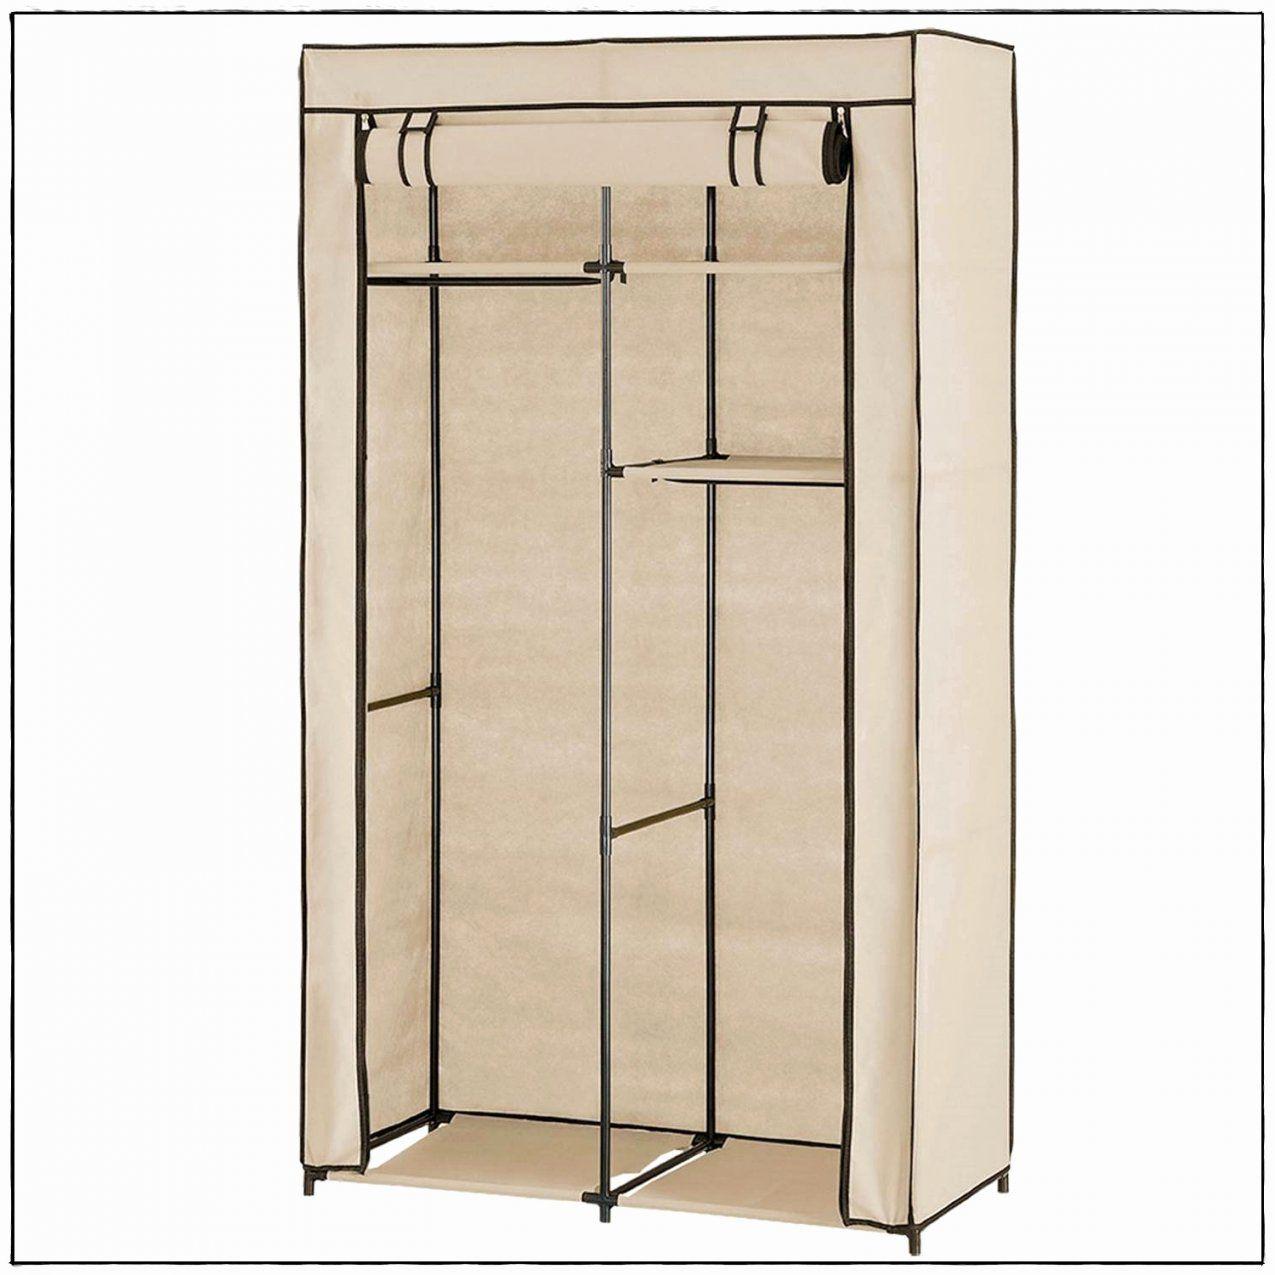 schrank 40 cm tief haus design ideen. Black Bedroom Furniture Sets. Home Design Ideas